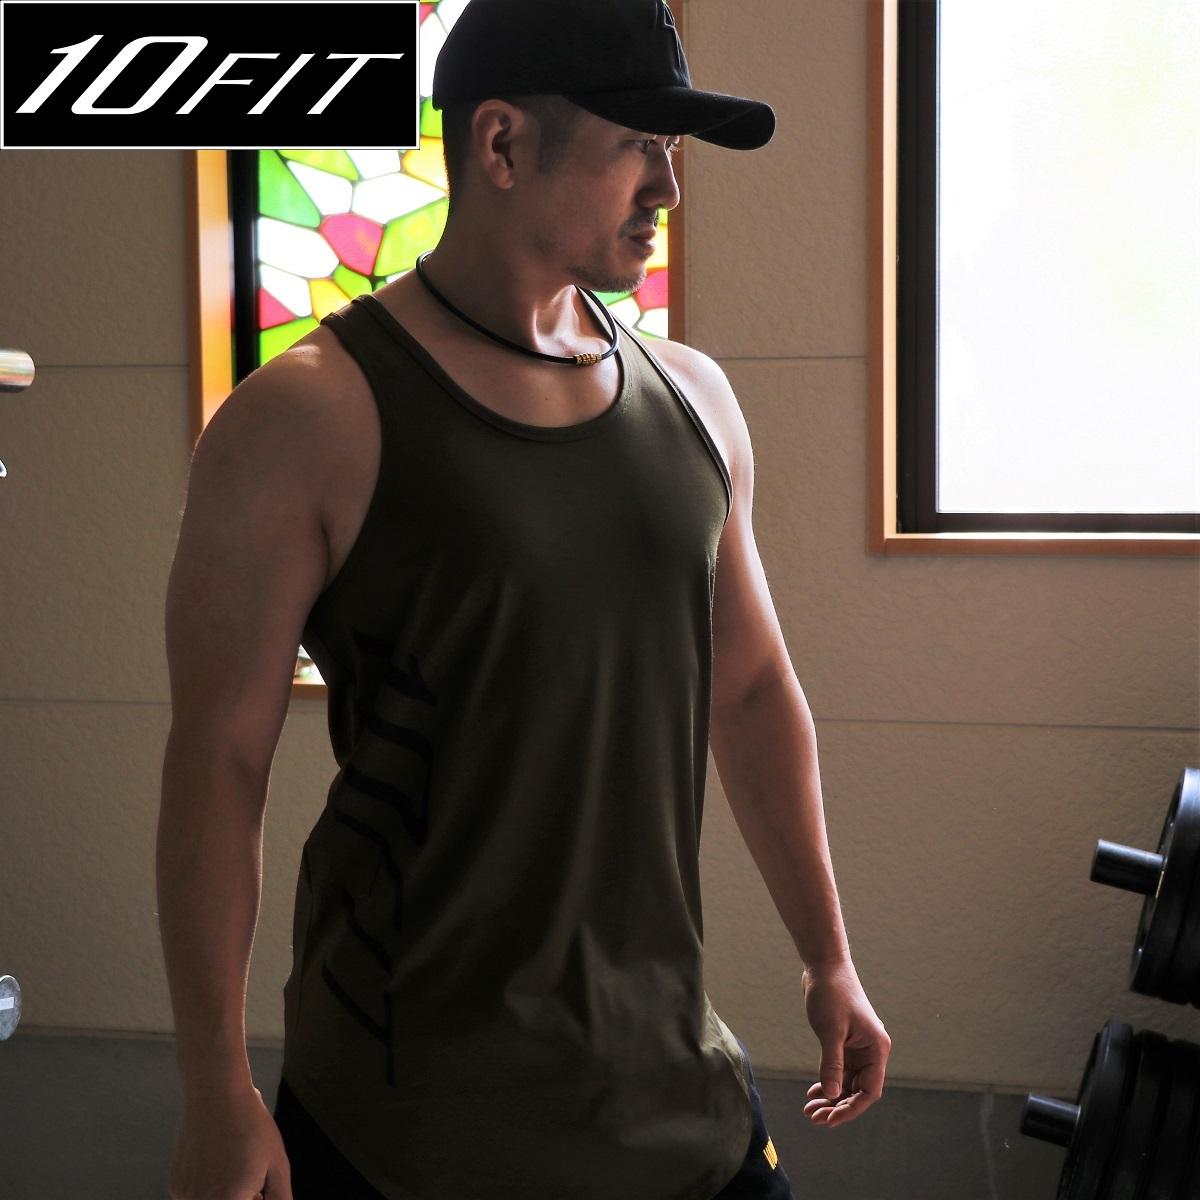 10FIT タンクトップ トレーニング 筋トレ ボディビル メンズ TE-19 カーキ ロング丈